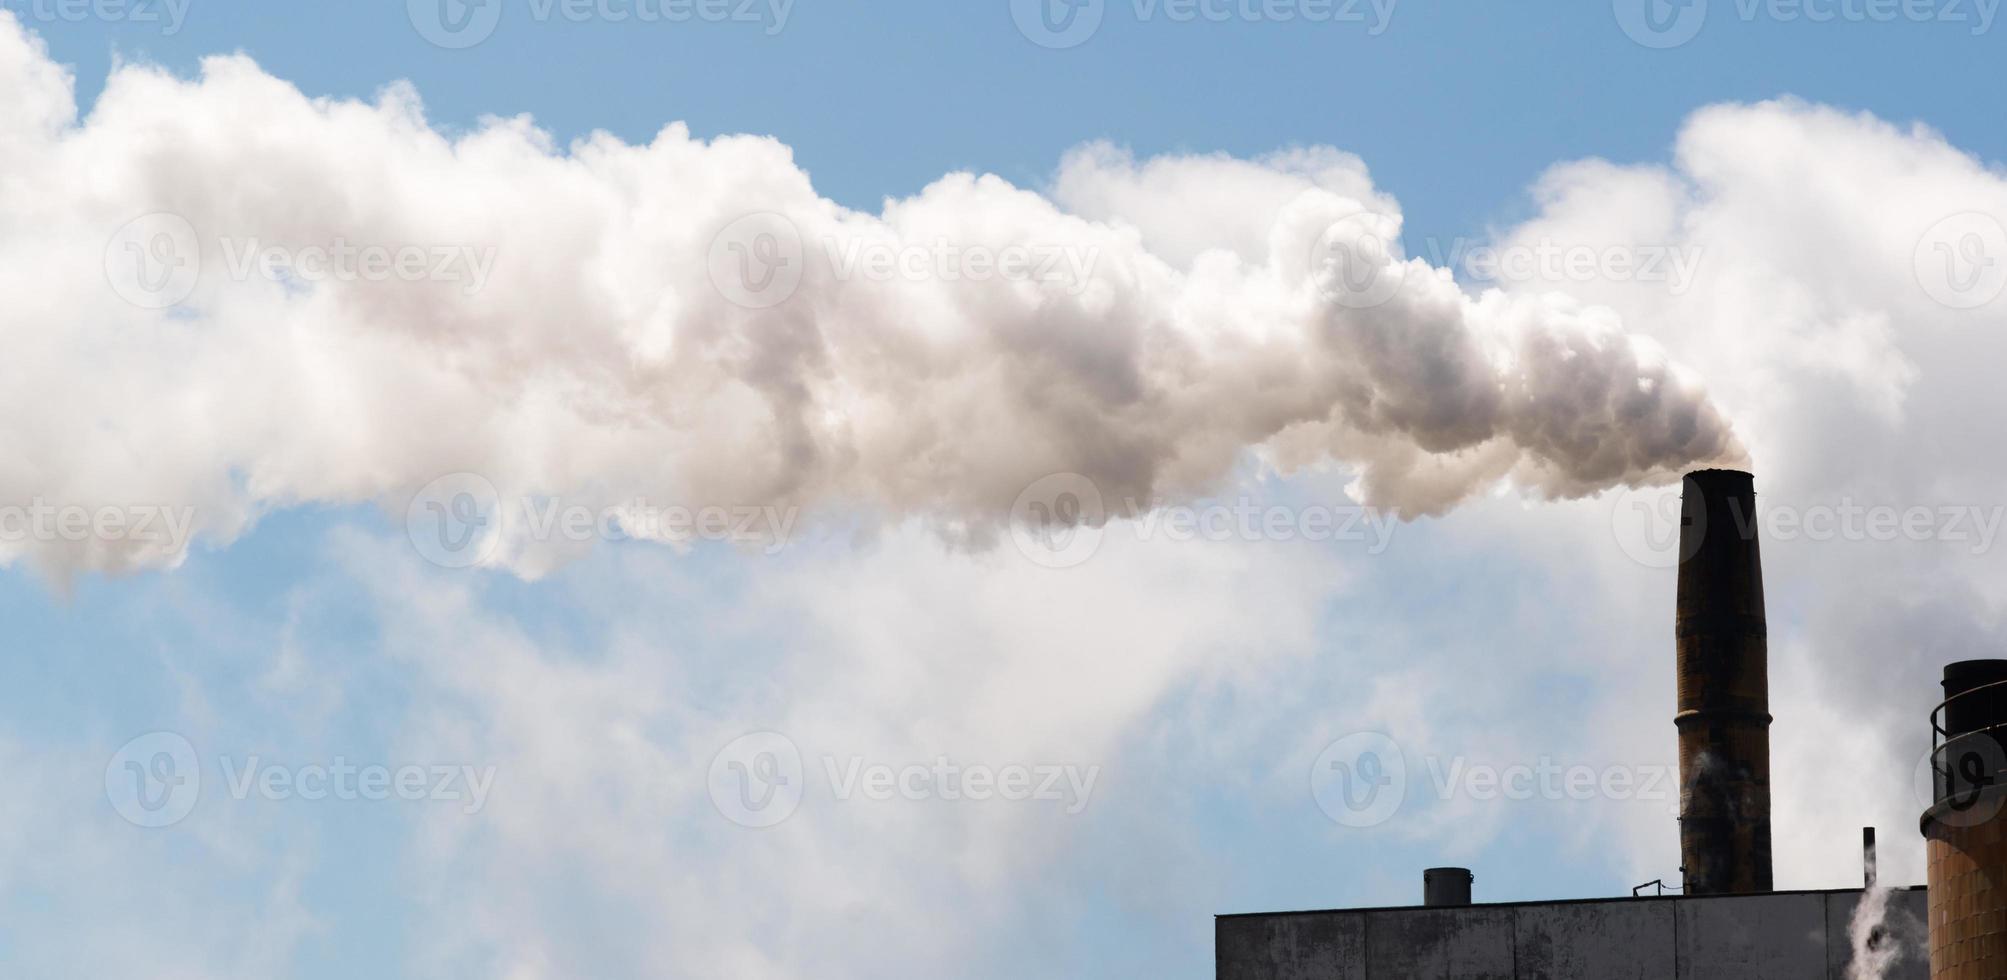 fábrica de papel chimenea humo blanco cielo azul foto